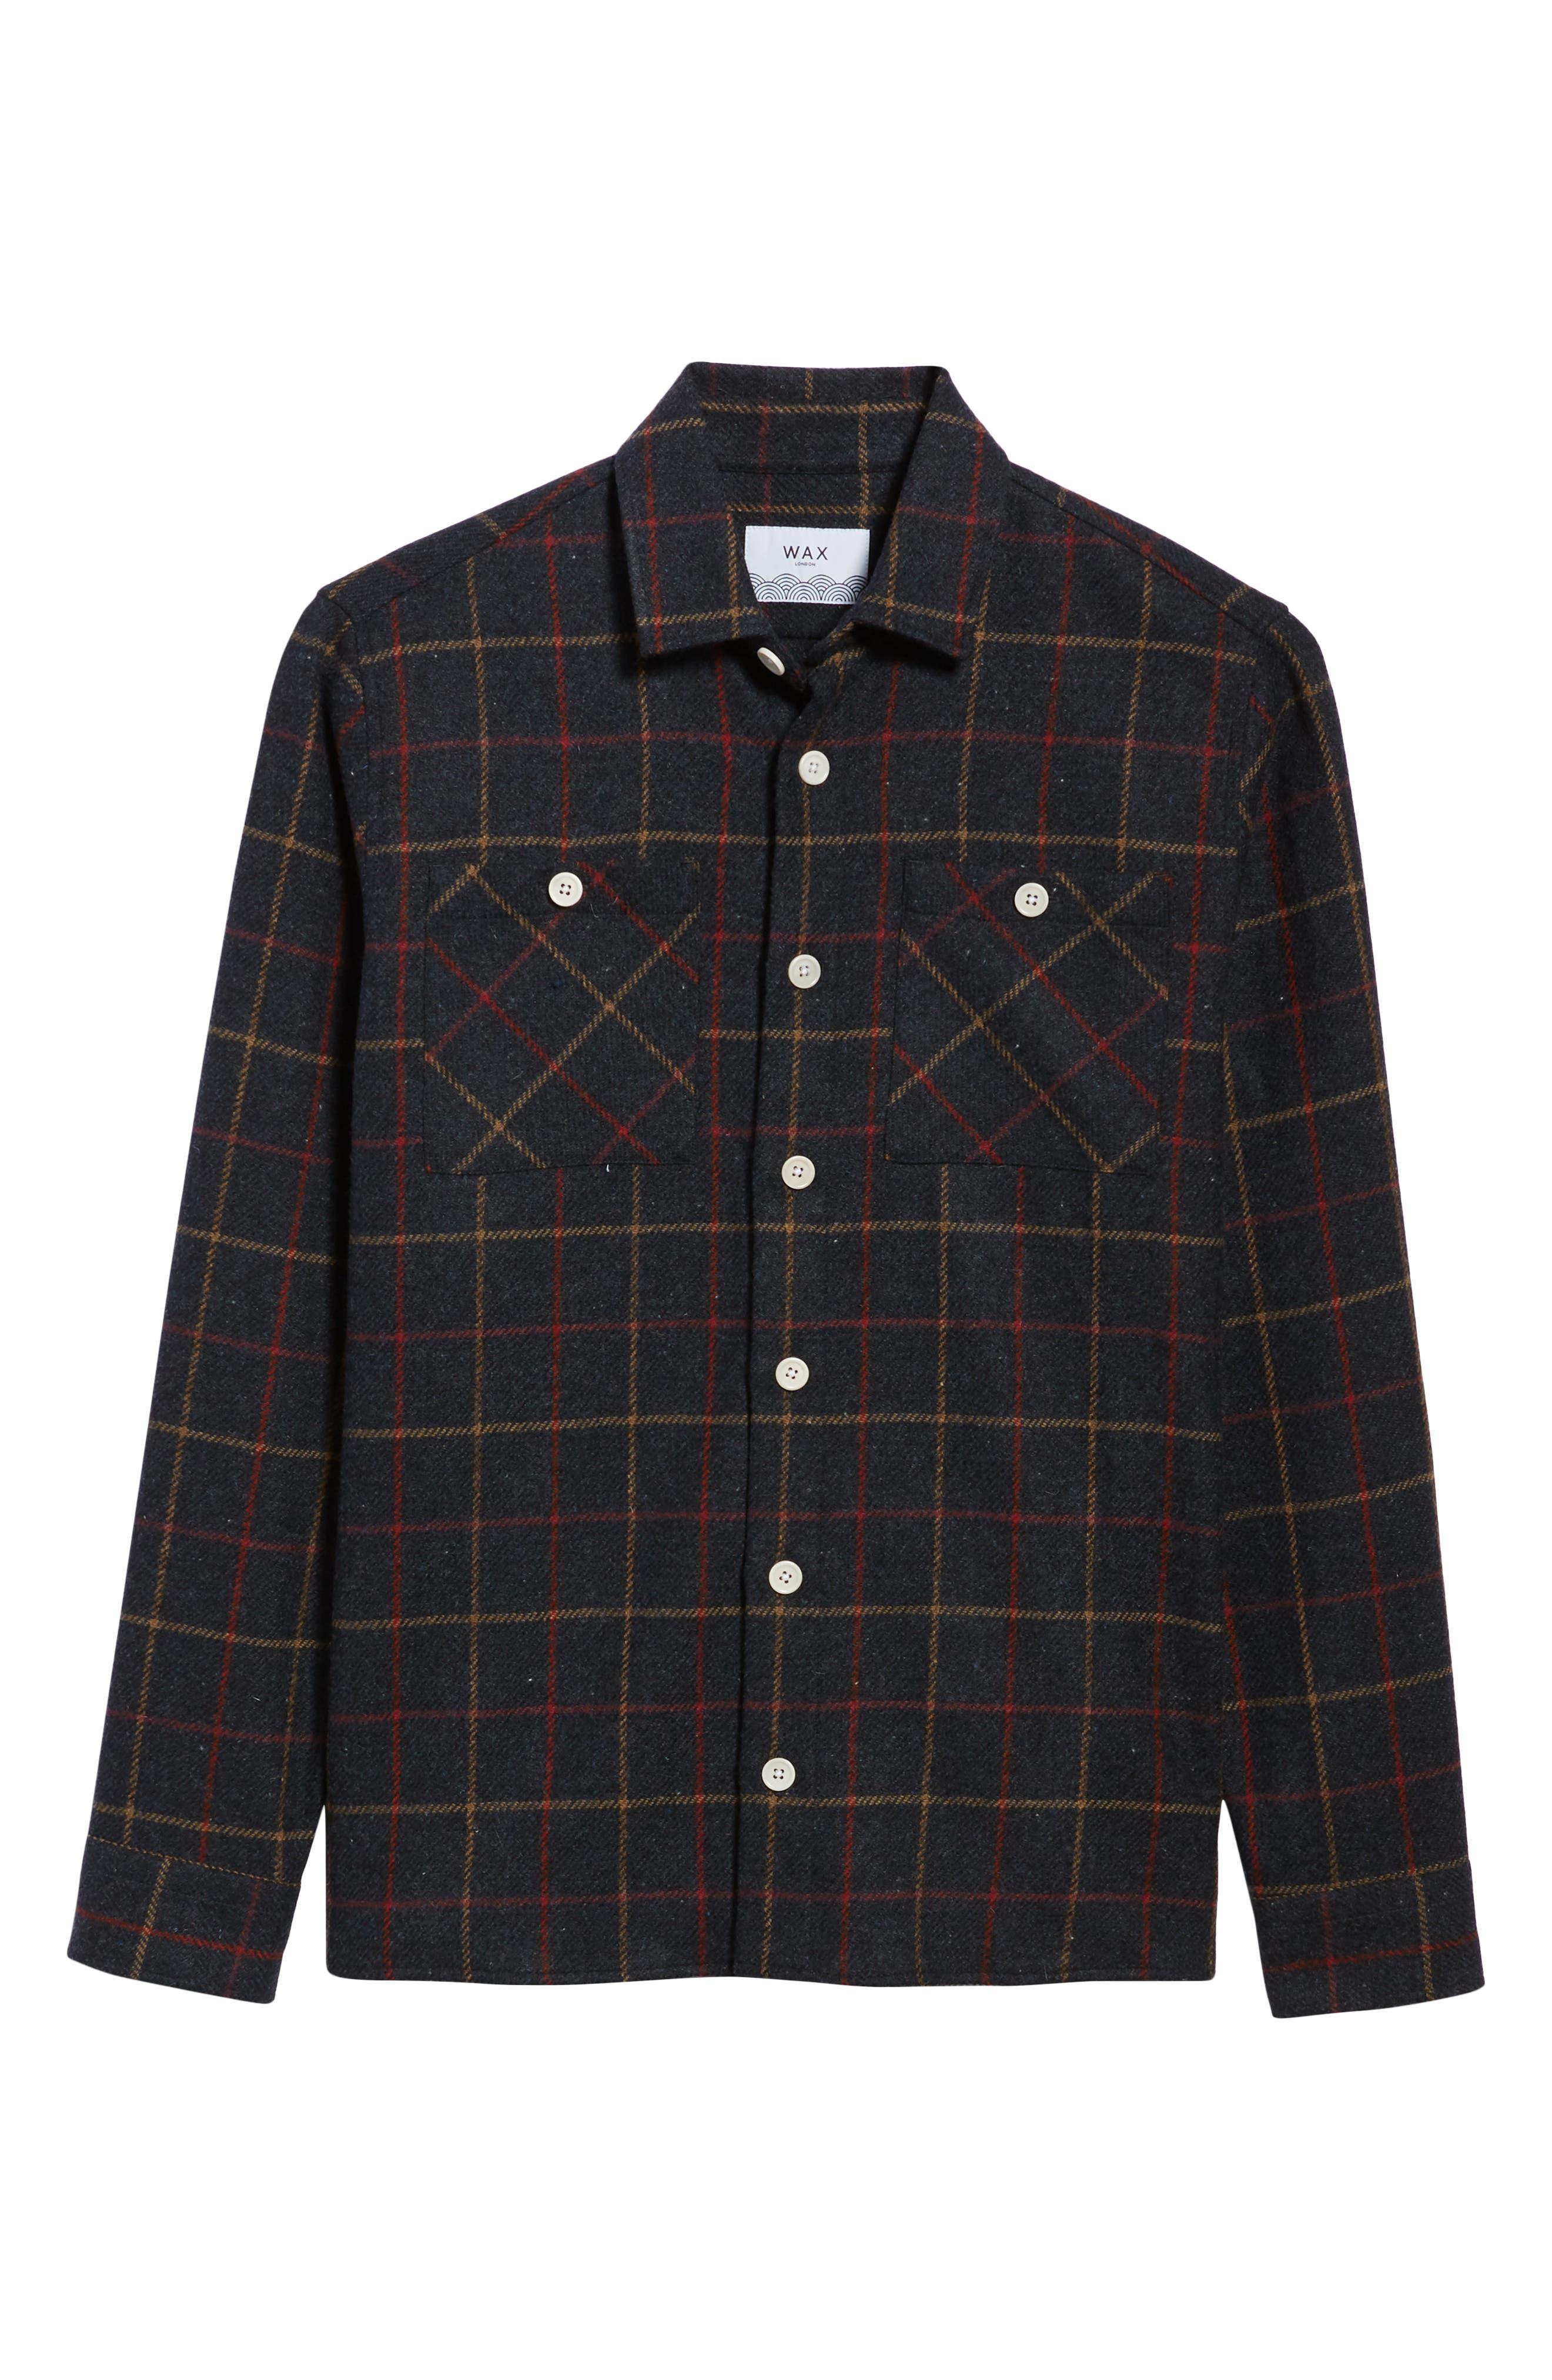 Whiting Tattersall Wool Shirt Jacket,                             Alternate thumbnail 6, color,                             BLACK WOOL CHECK